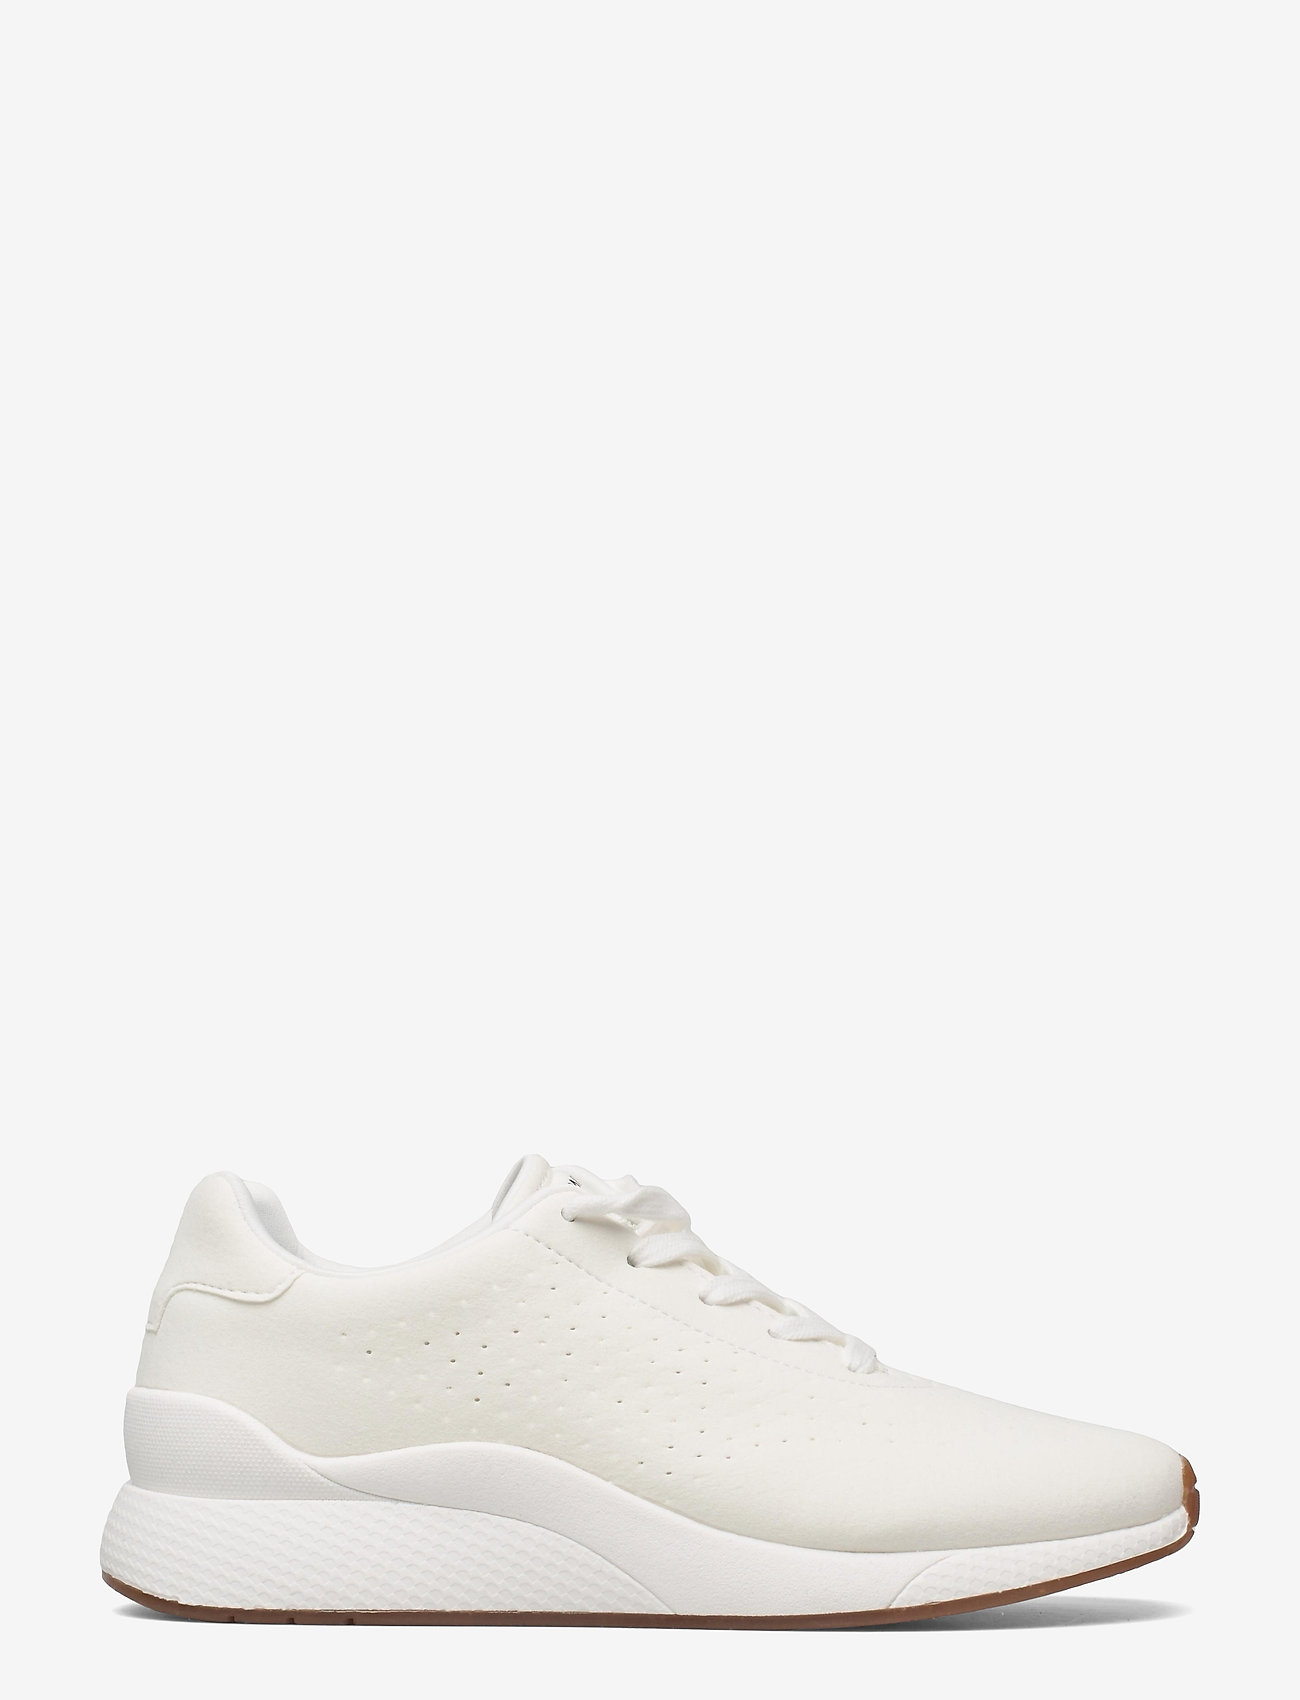 Vero Moda - VMMANAMO SNEAKER - låga sneakers - snow white - 1